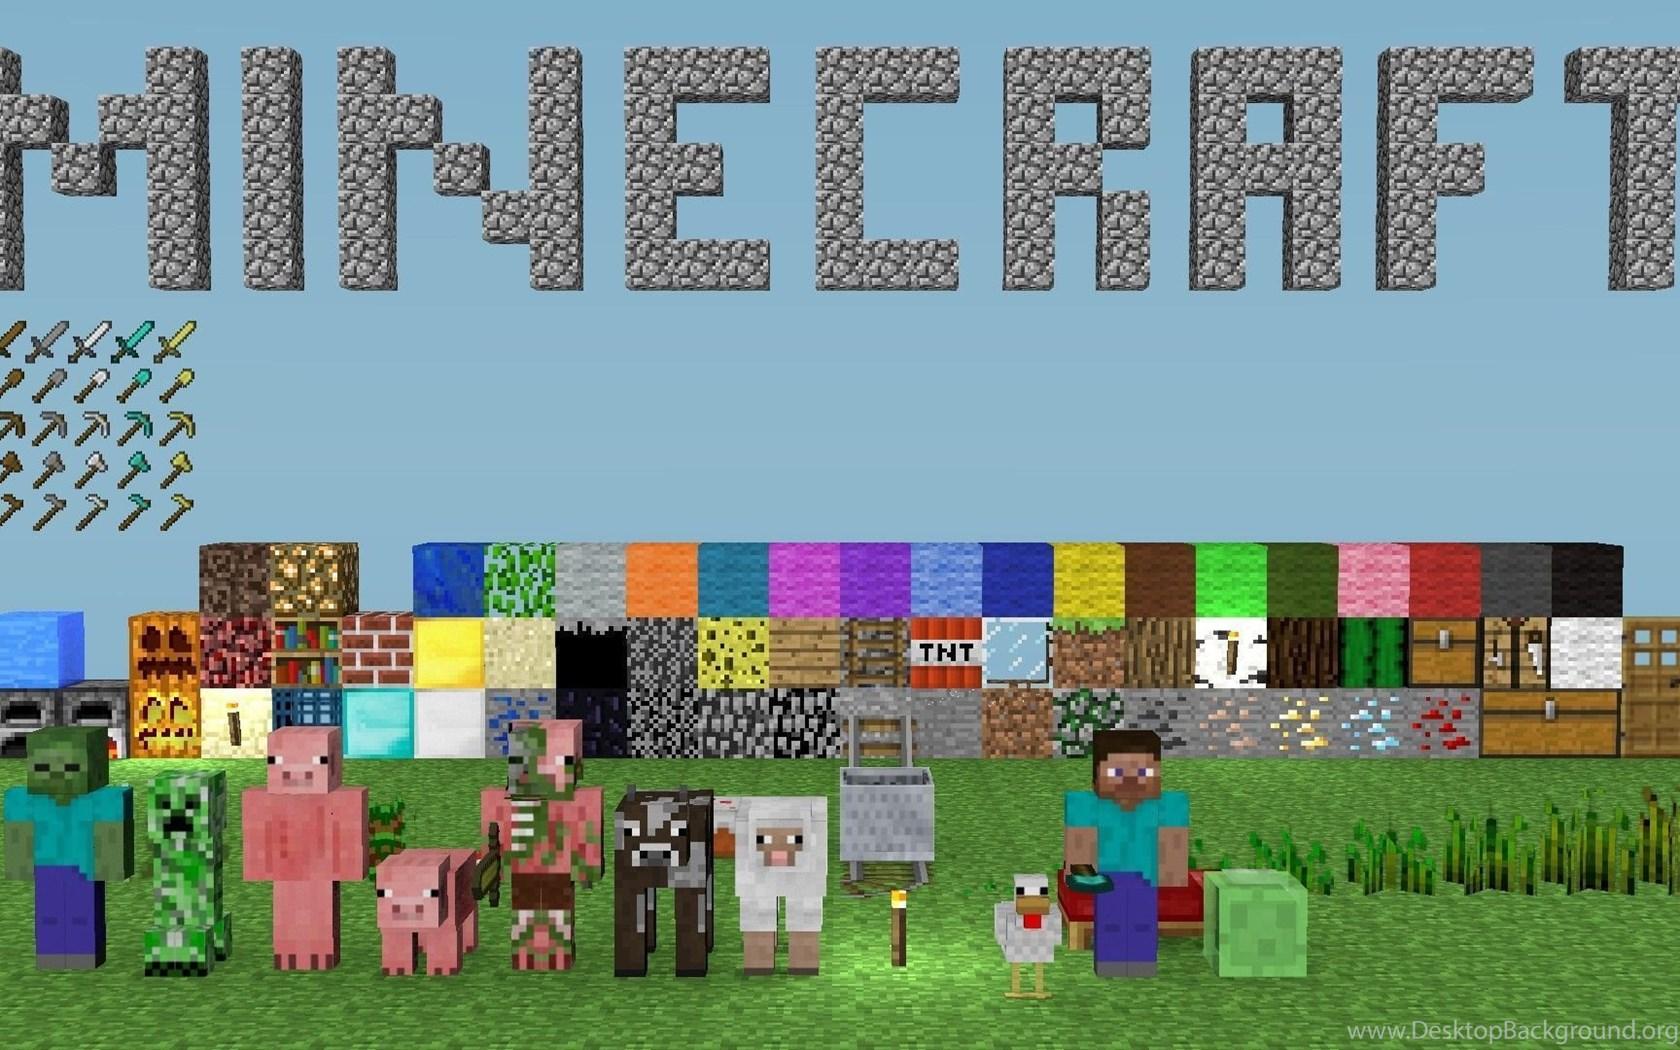 Minecraft Wallpapers For Computer Desktop Background